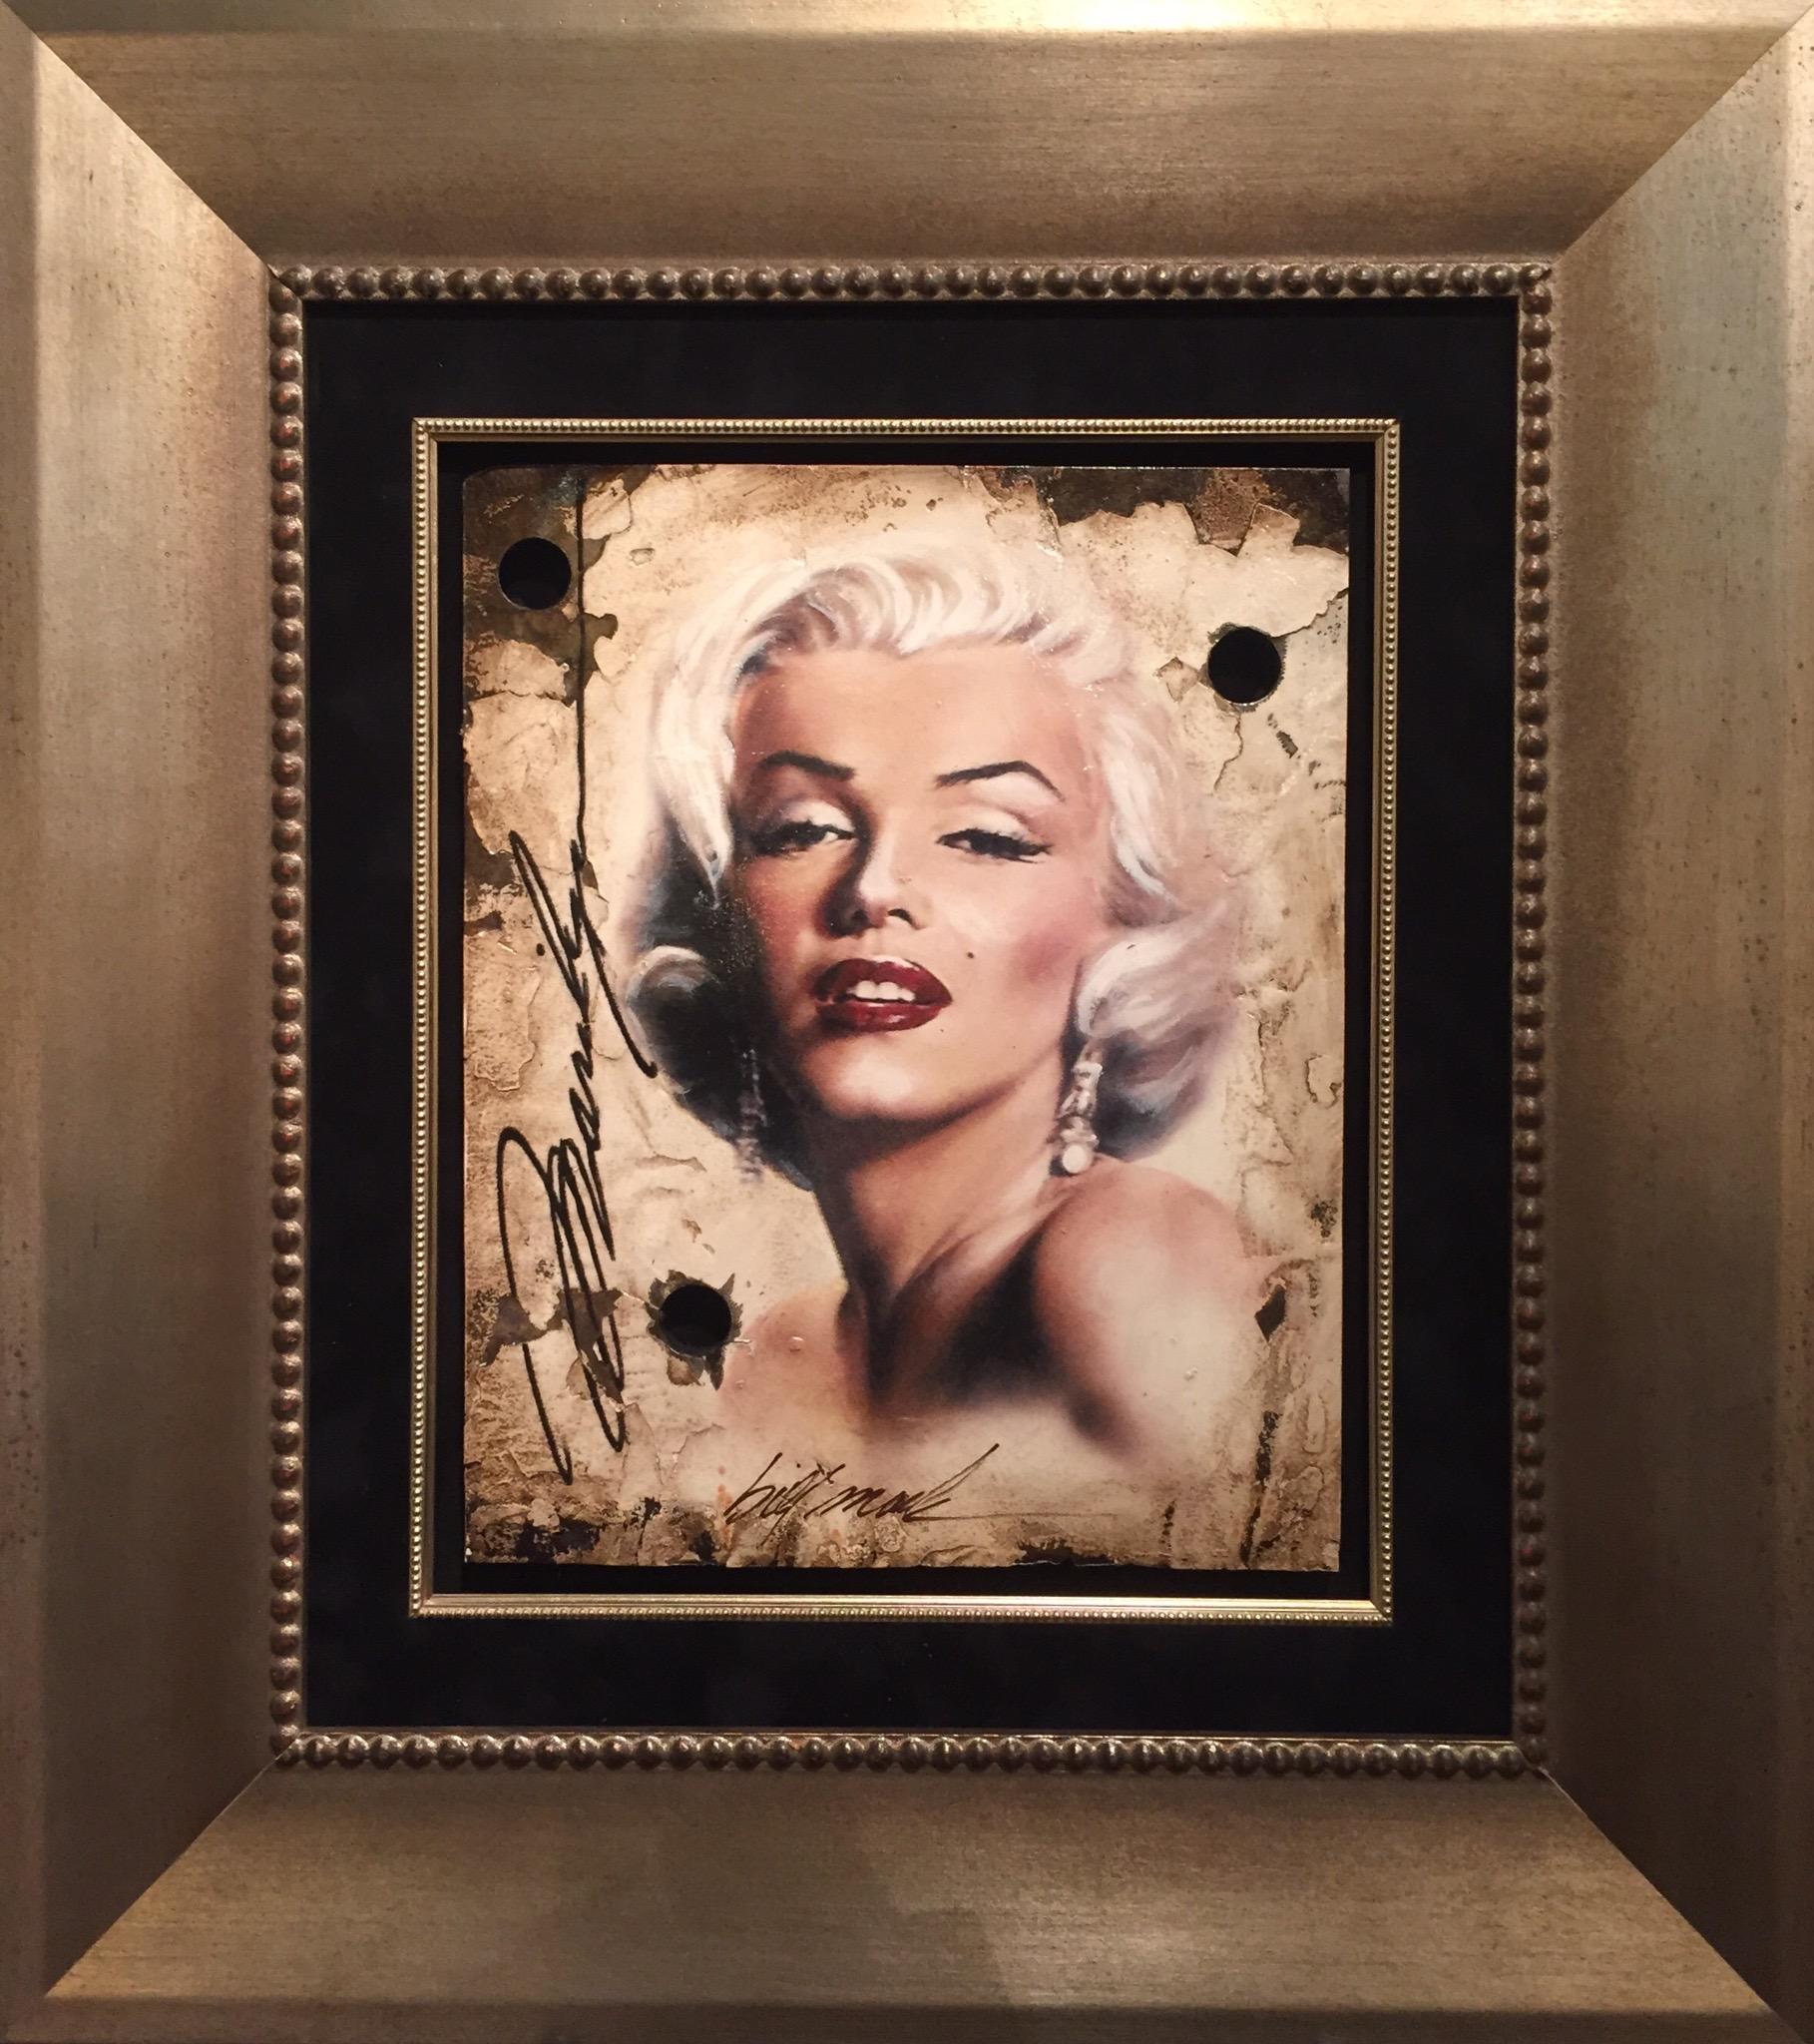 Glamorous by  Bill Mack - Masterpiece Online